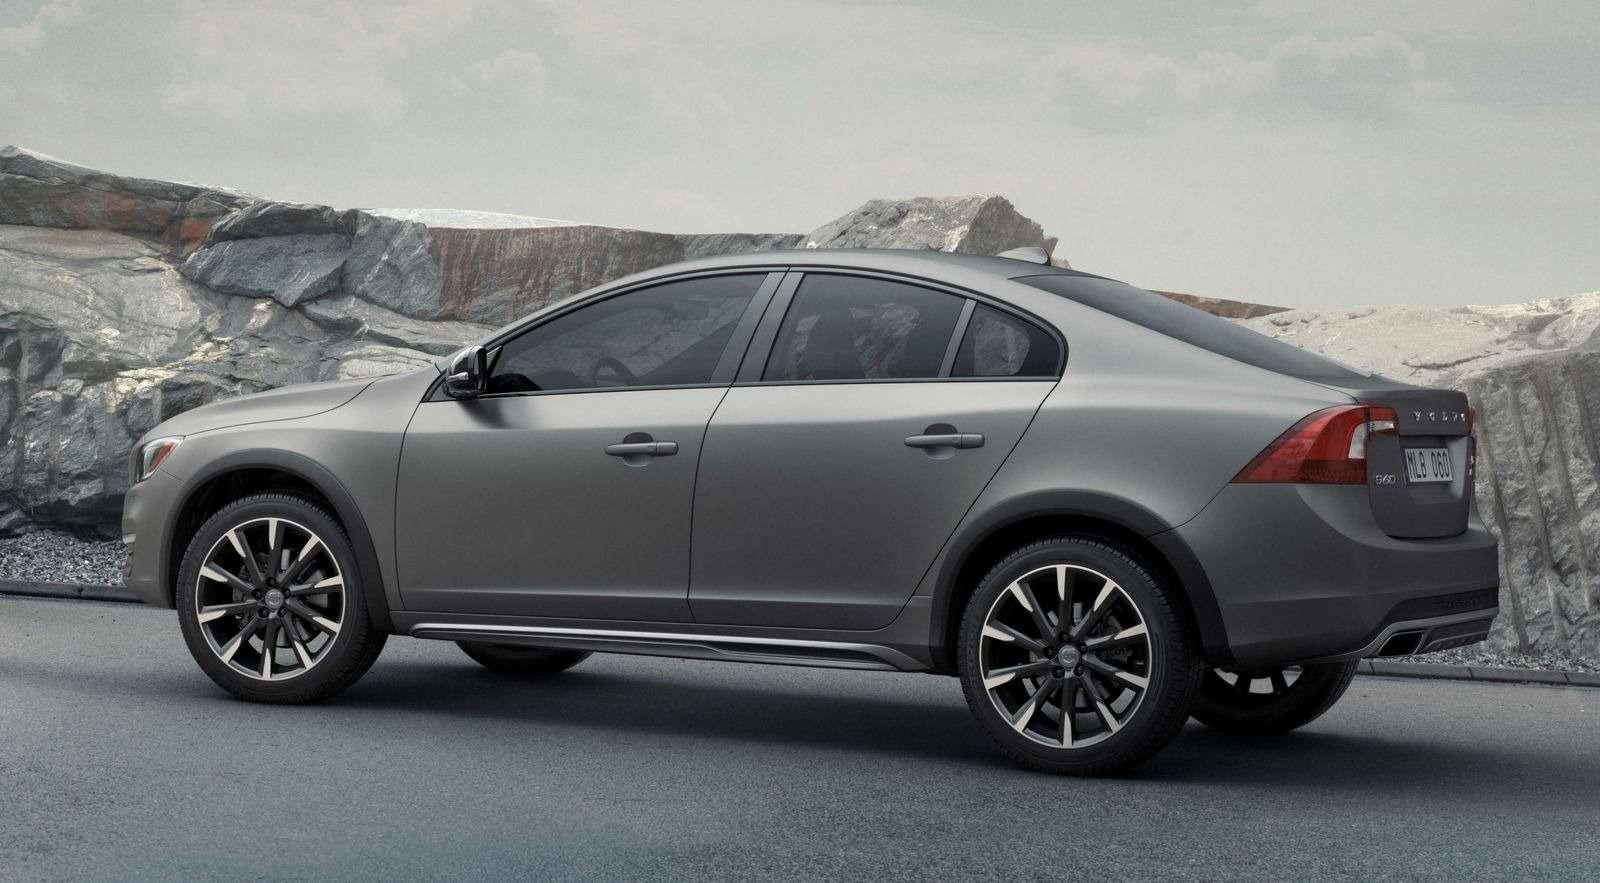 Volvo Car снизила цены наряд моделей— фото 375833